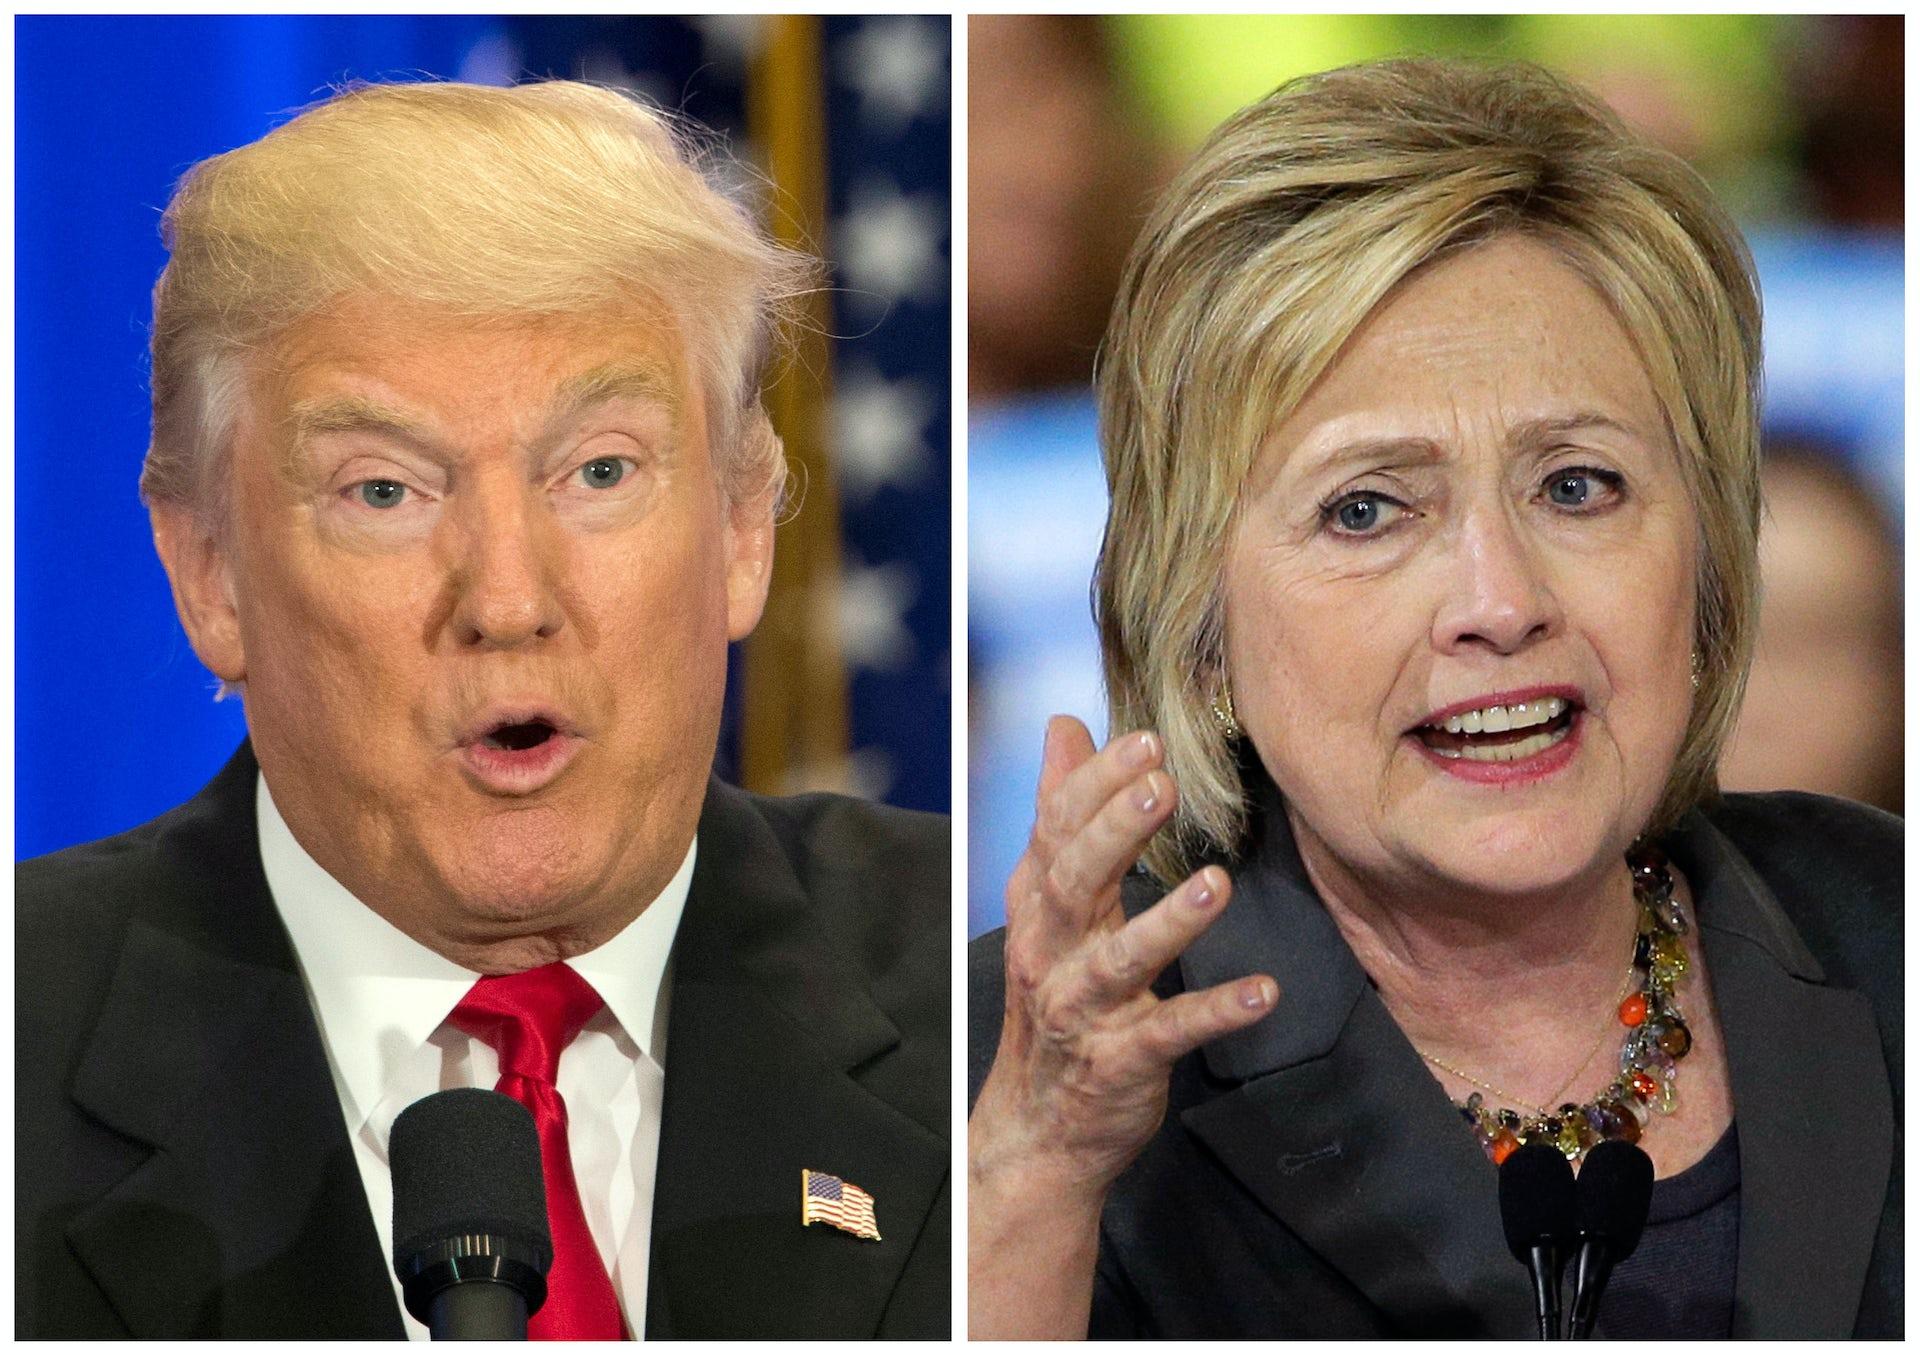 Russian Twitter Propaganda Predicted 2016 U.S. Election Polls